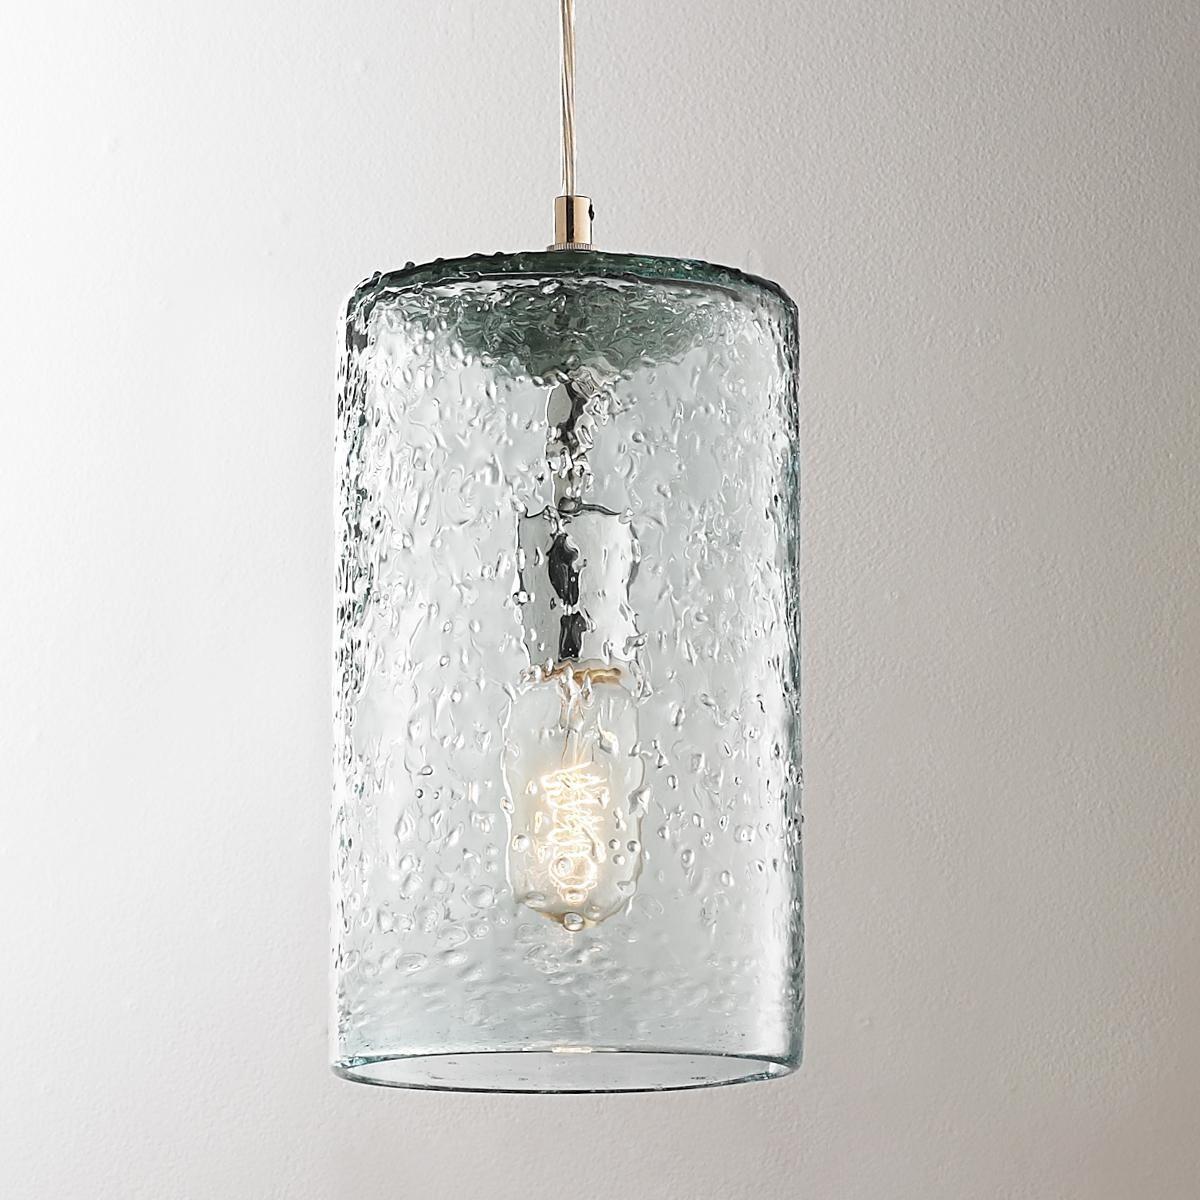 Pebbled Glass Cylinder Pendant Coastal Pendant Lighting Glass